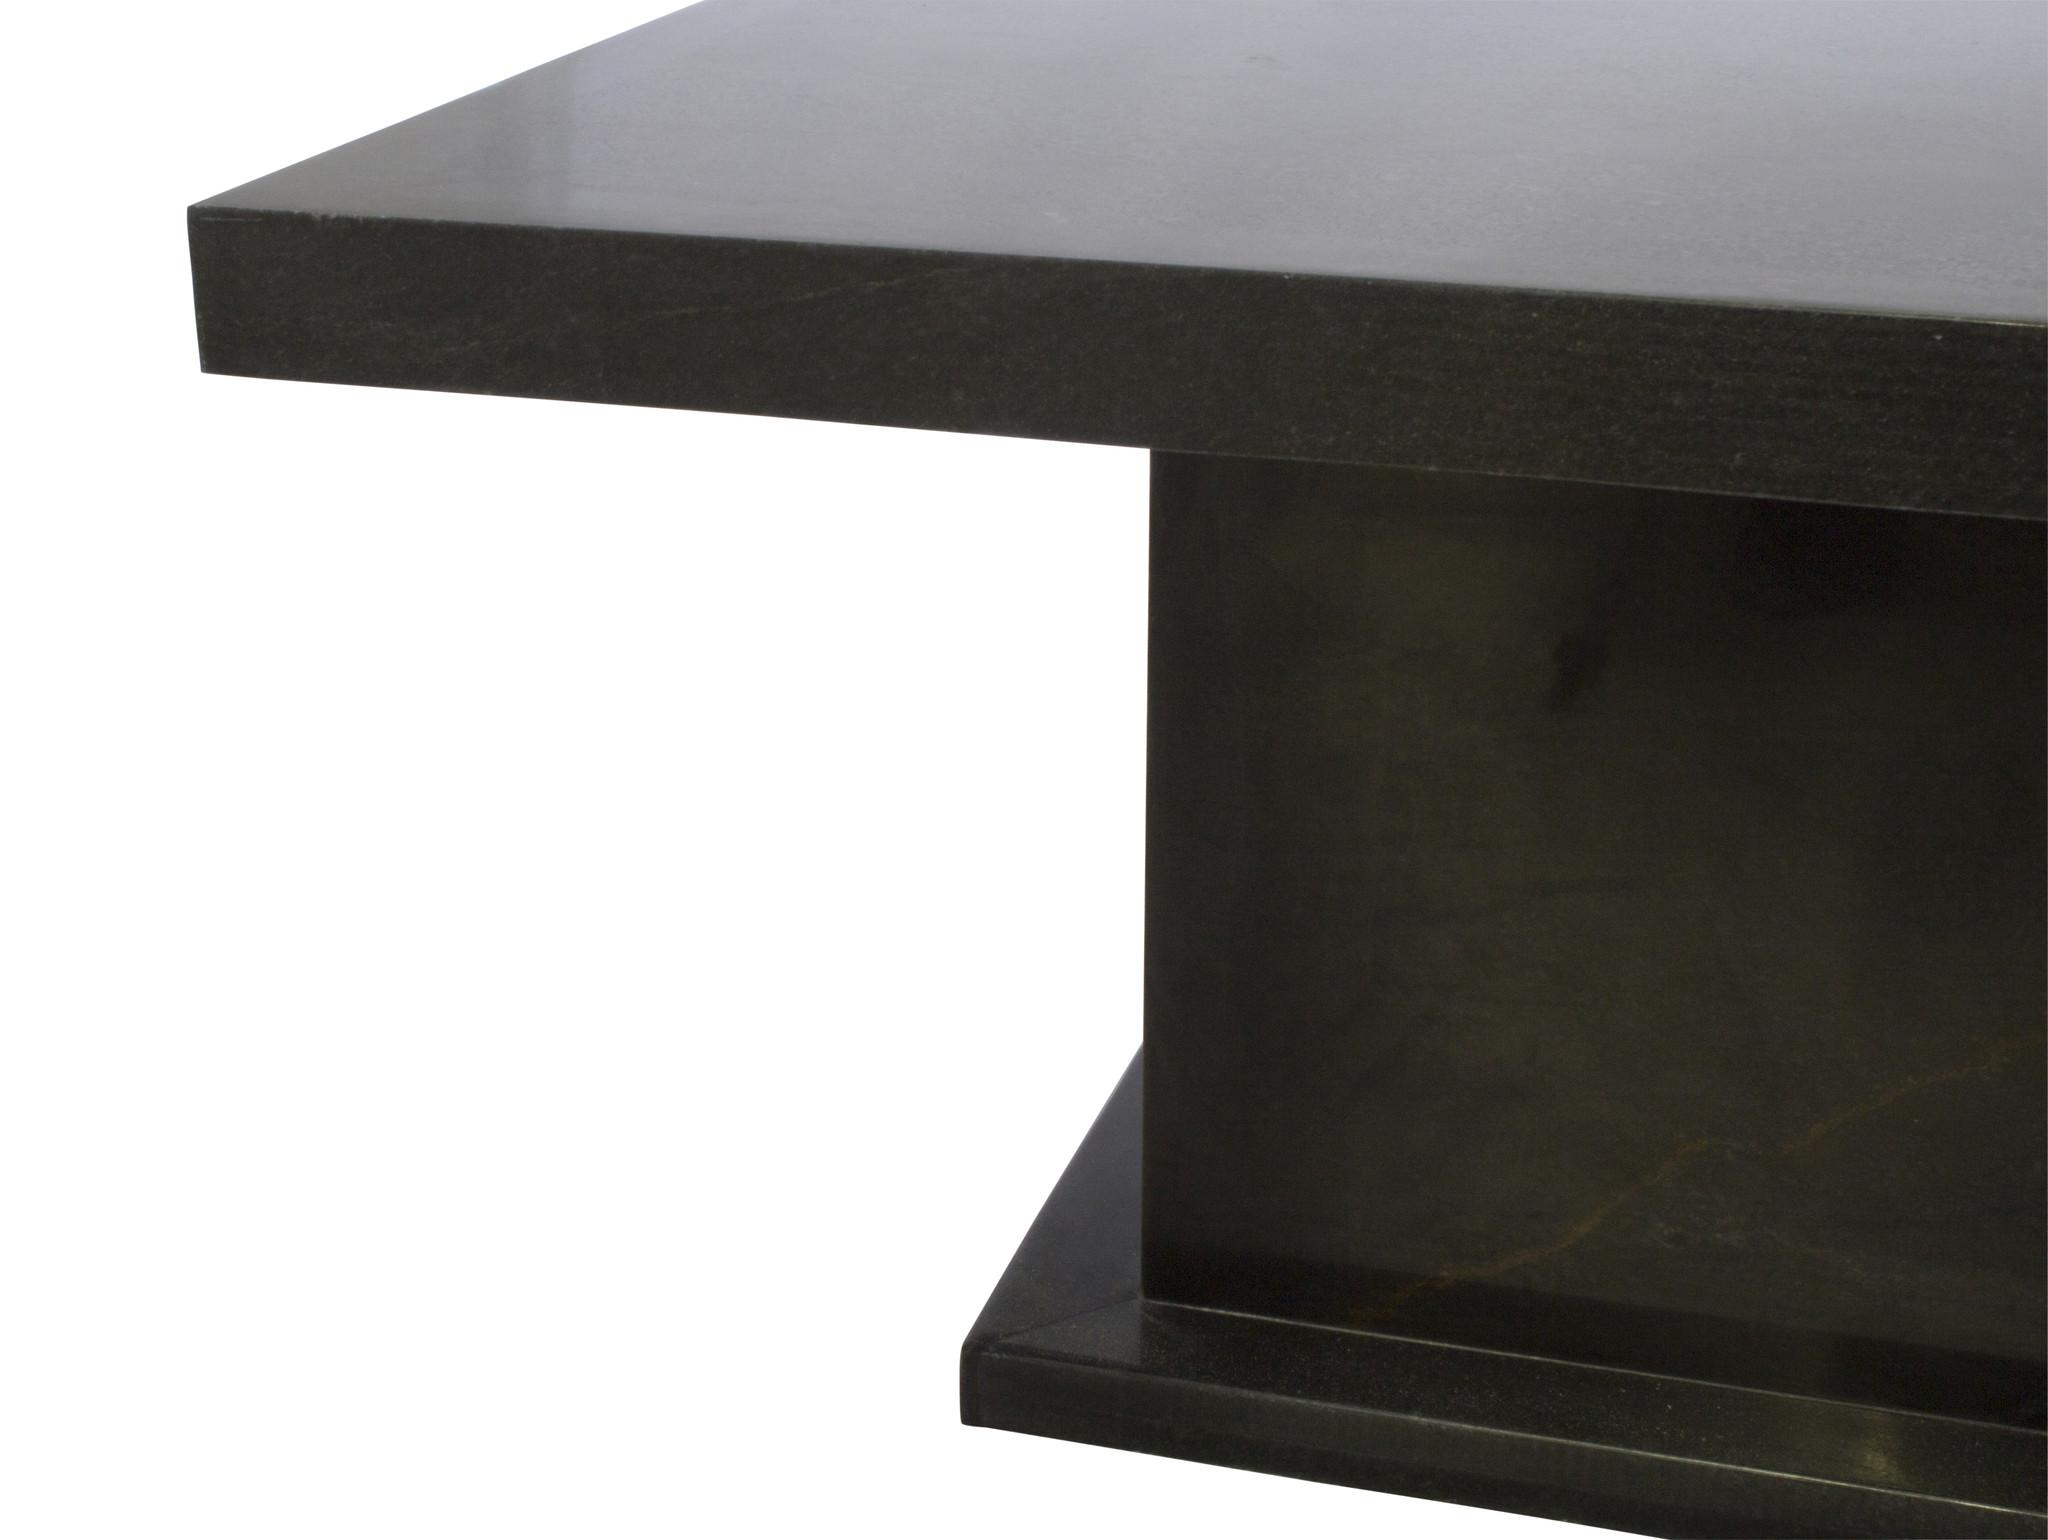 Indomarmer Couchtisch Rechteck 110x70x45 cm Schwarz Marmor